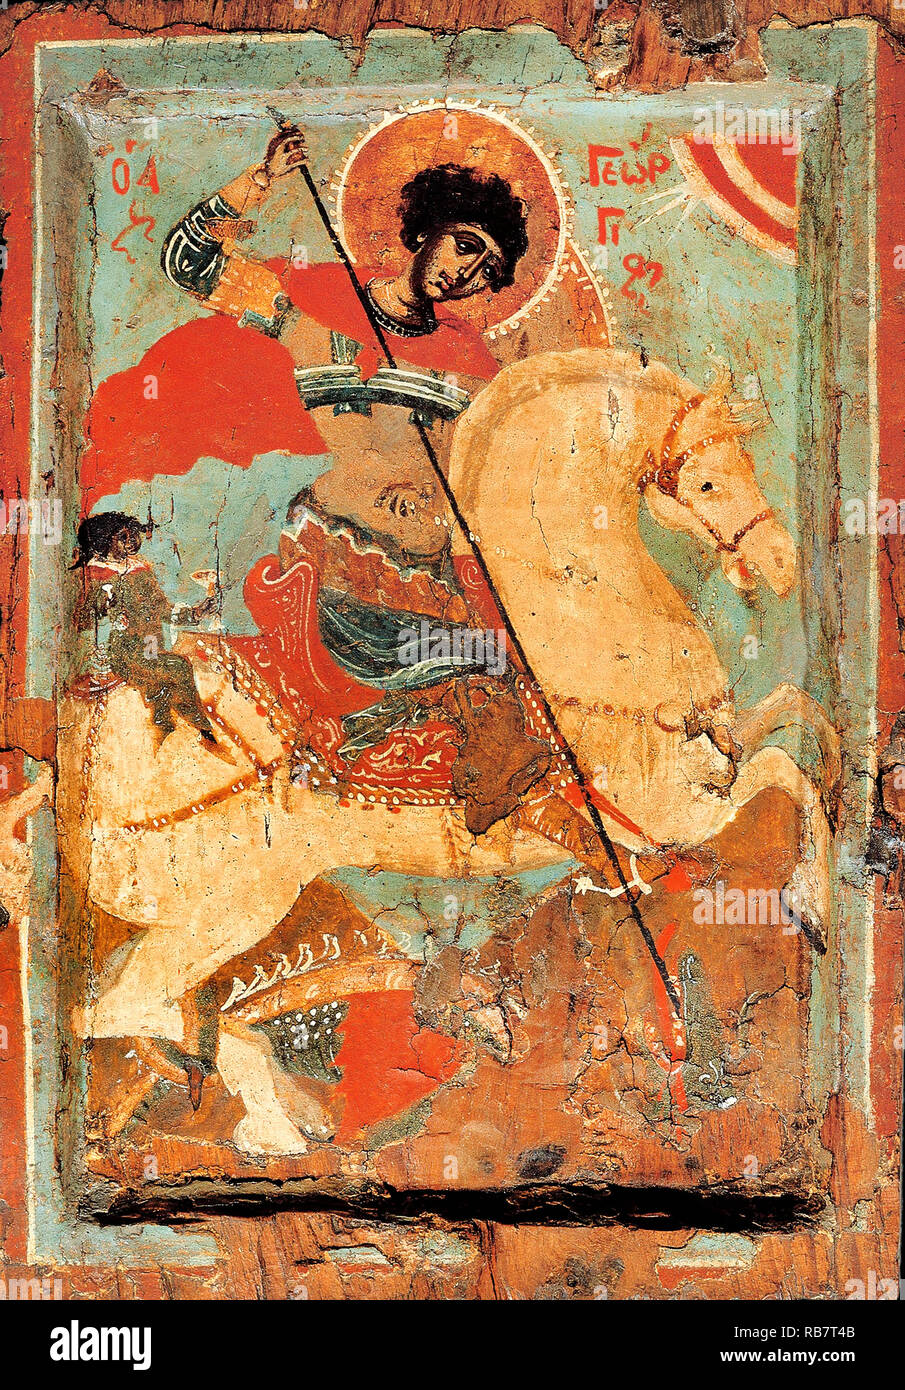 Macedonian workshop, St. George the Dragon-slayer on Horseback, Circa 1550-1599 Icon, Benaki Museum, Athens, Greece. - Stock Image